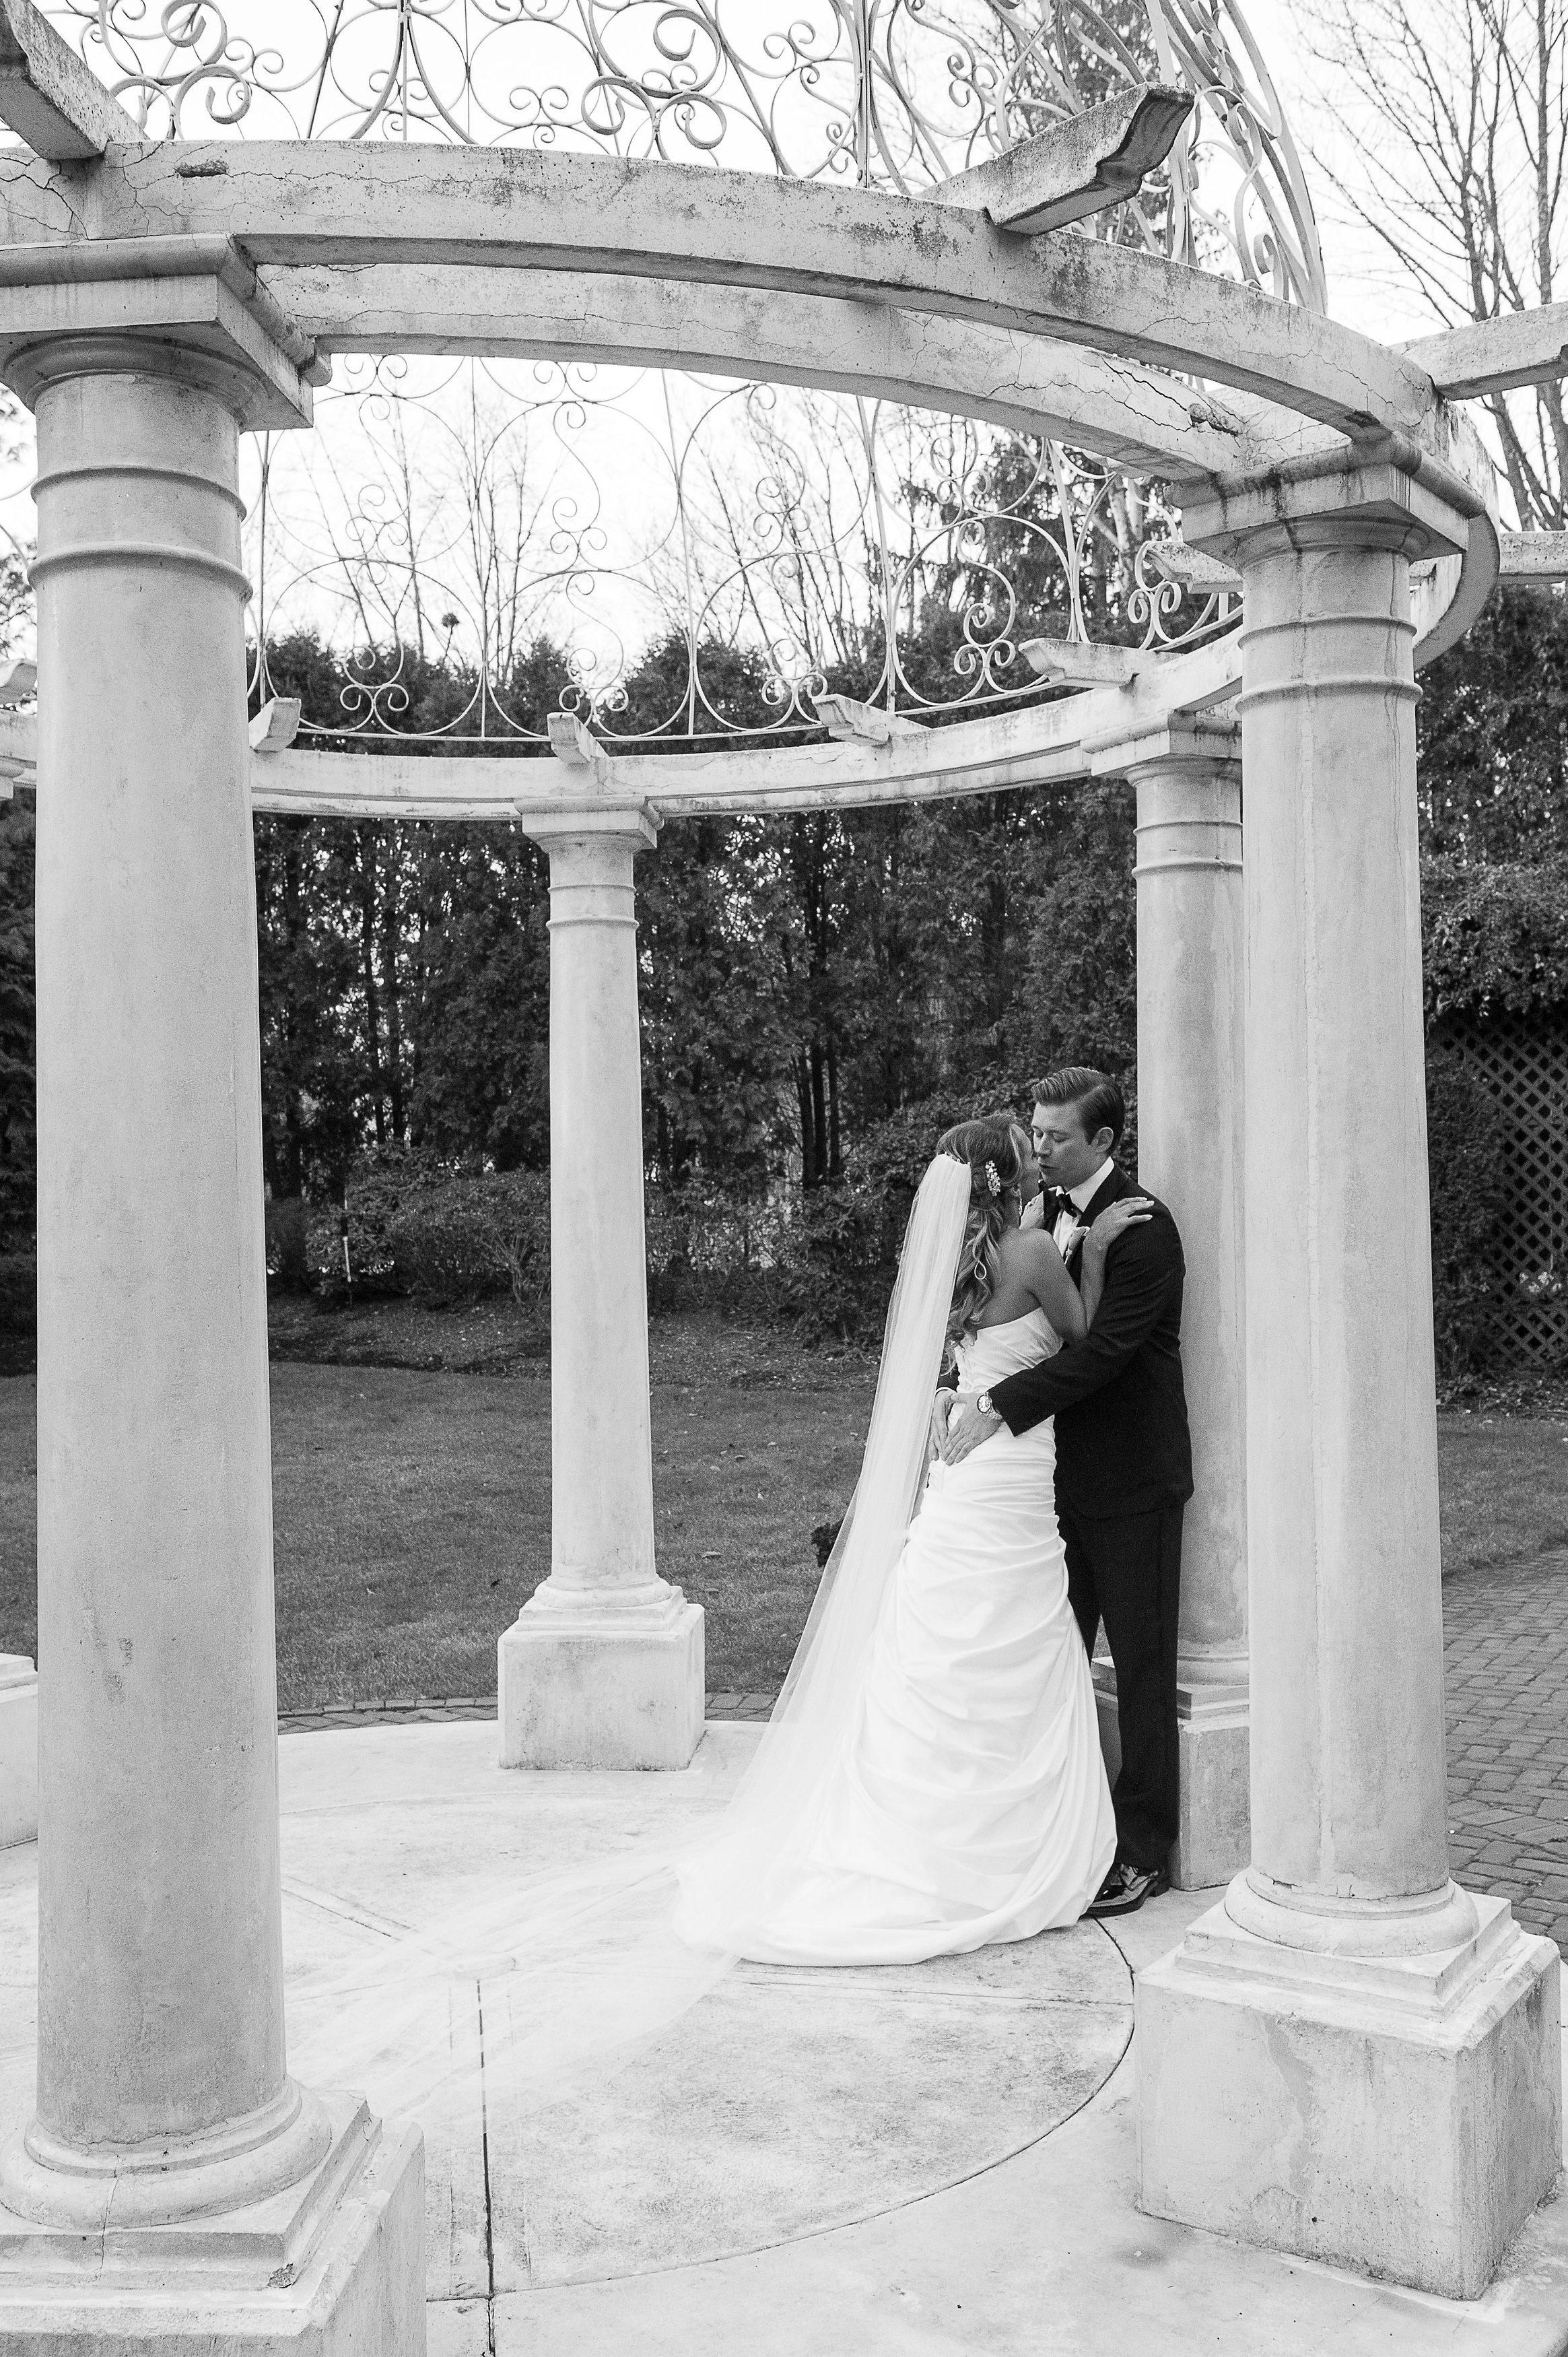 Ceci_New_York_Custom_Invitation_ New_Jersey_Wedding_Luxury_Personalized_Ceci_Style_Bride_Foil_Stamping103.JPG